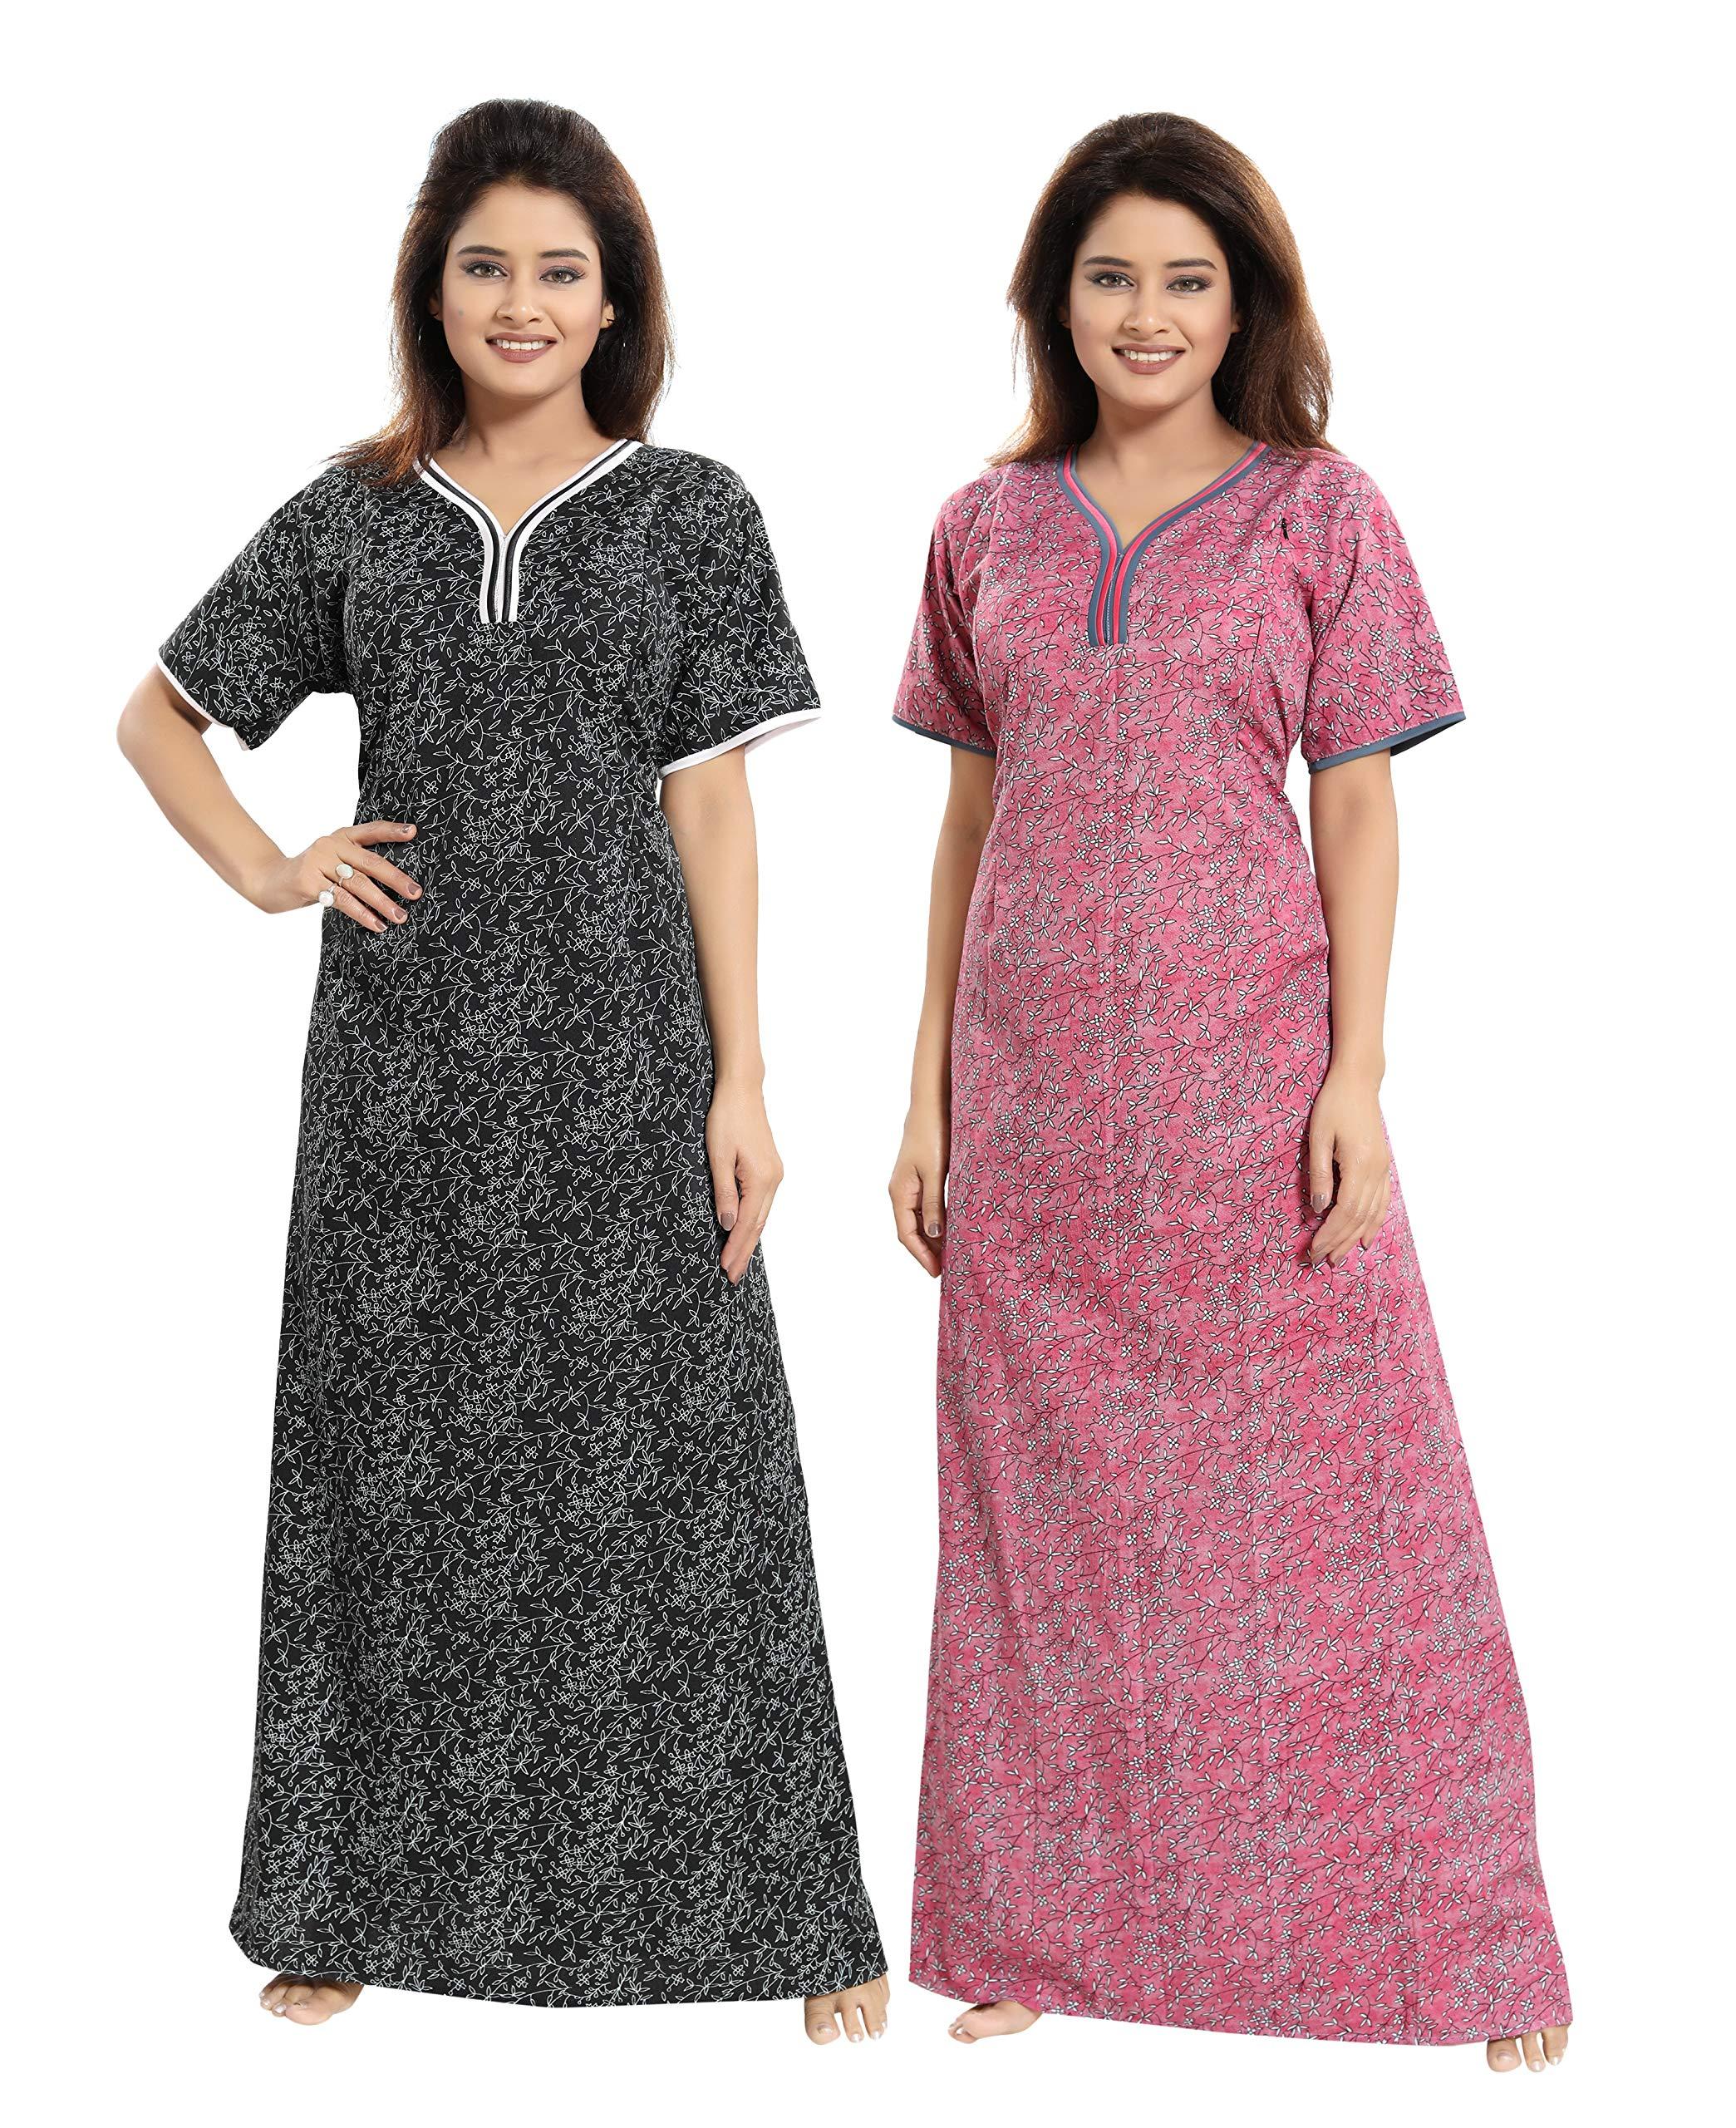 49ec52ff2 TUCUTE Women Beautiful Print Poly-Cotton Invisible Zip Pattern  Feeding Maternity Nursing Nighty Night Gown Nightwear ...